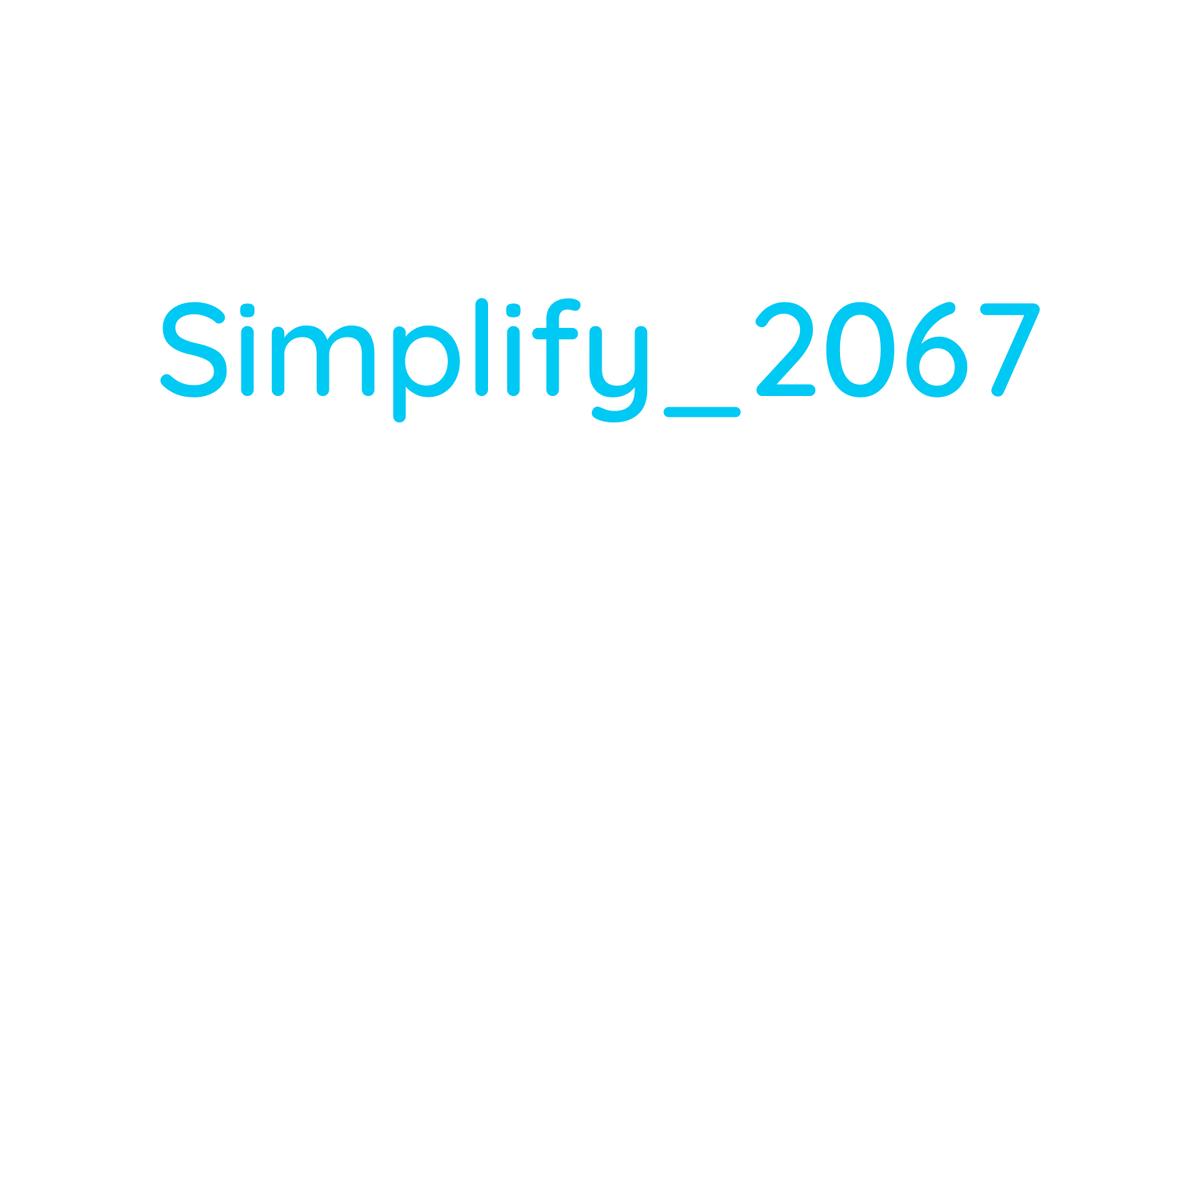 simplify2067